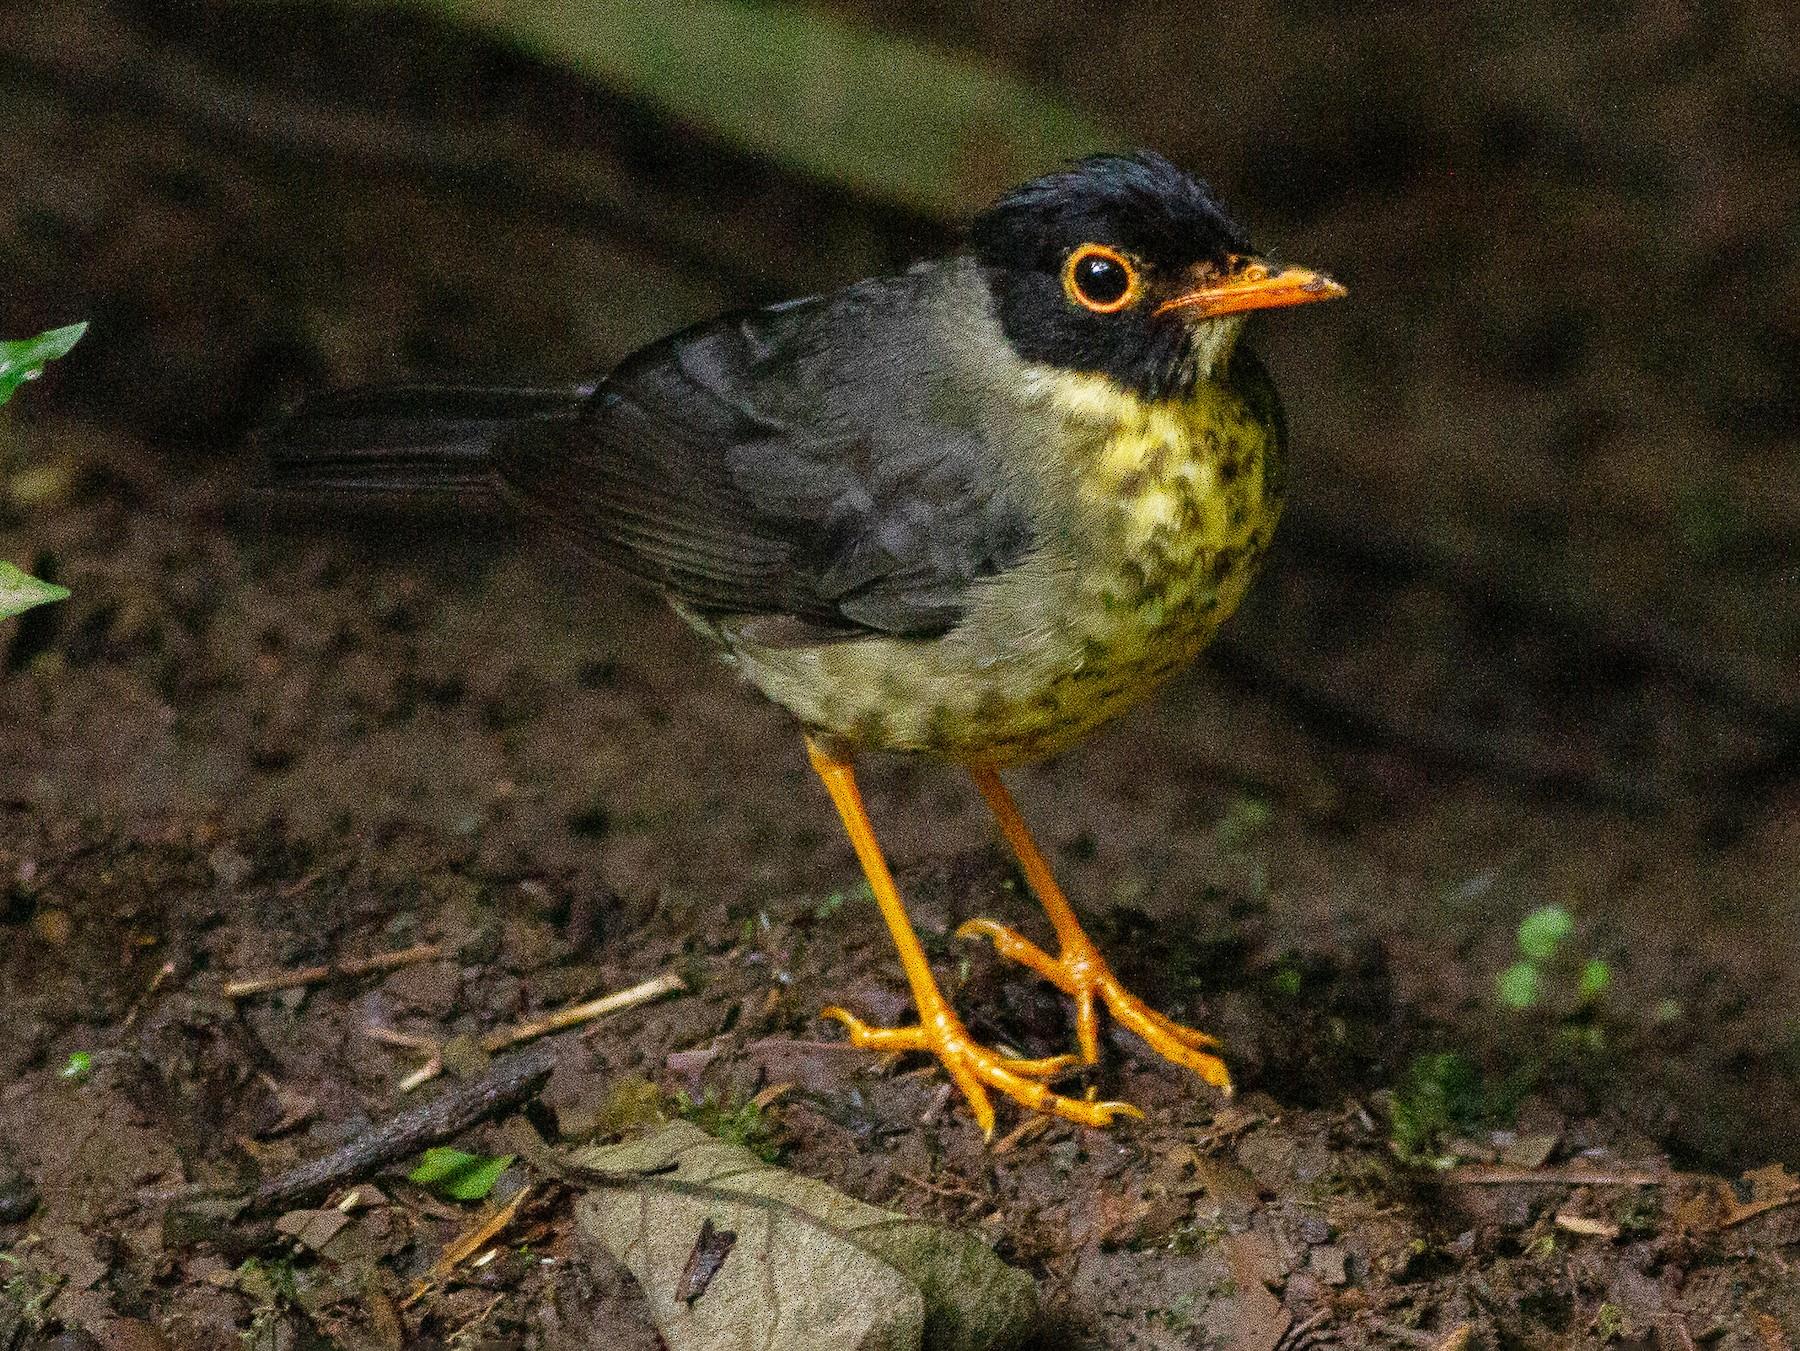 Speckled Nightingale-Thrush - Angus Pritchard